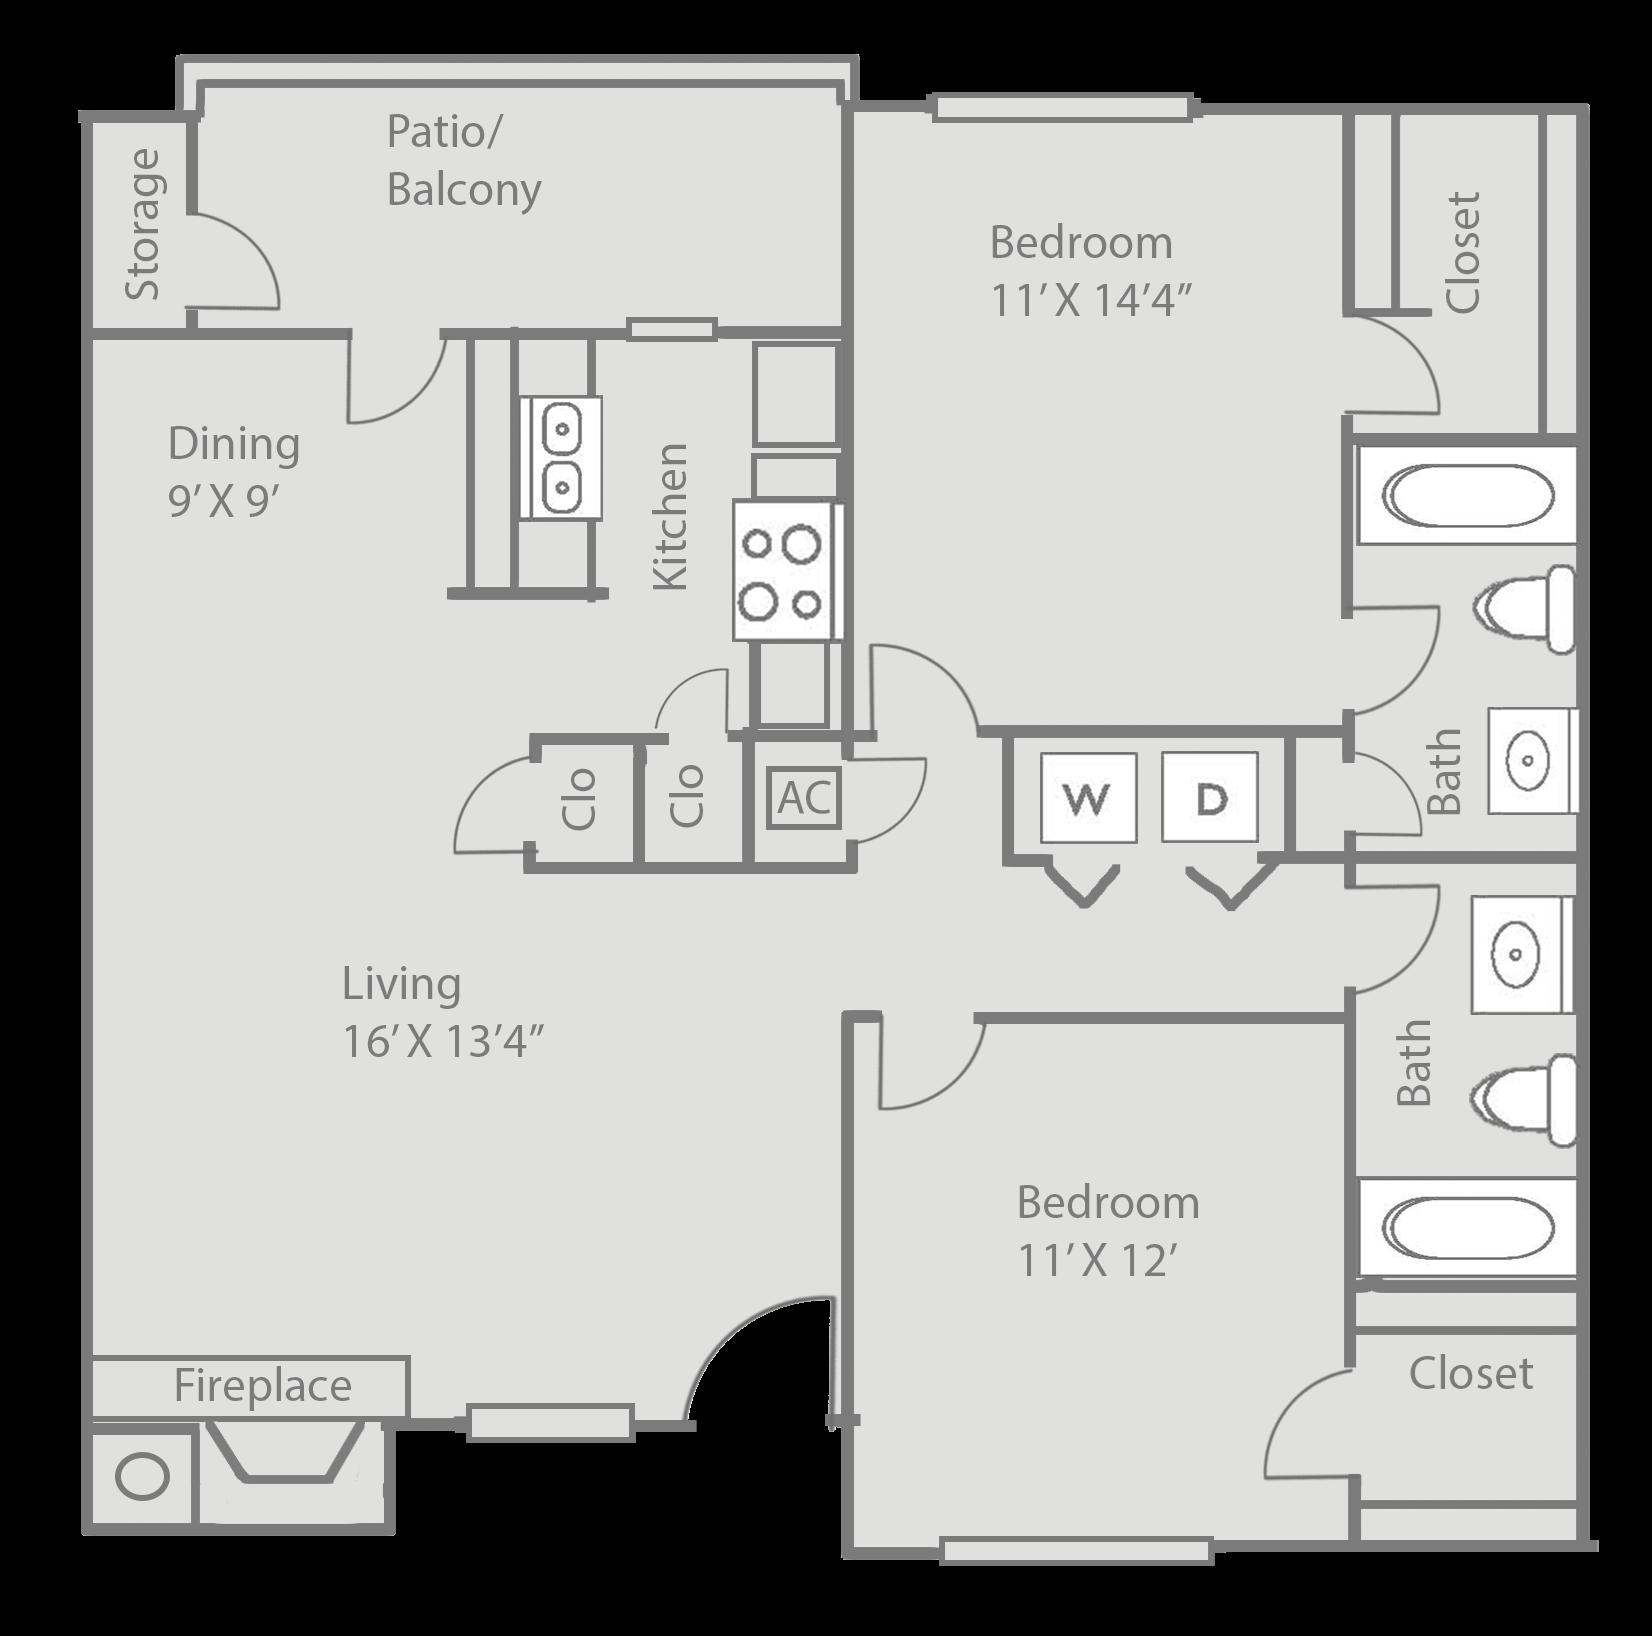 Floor Plans Of Ridgecrest Apartments In Denton, TX